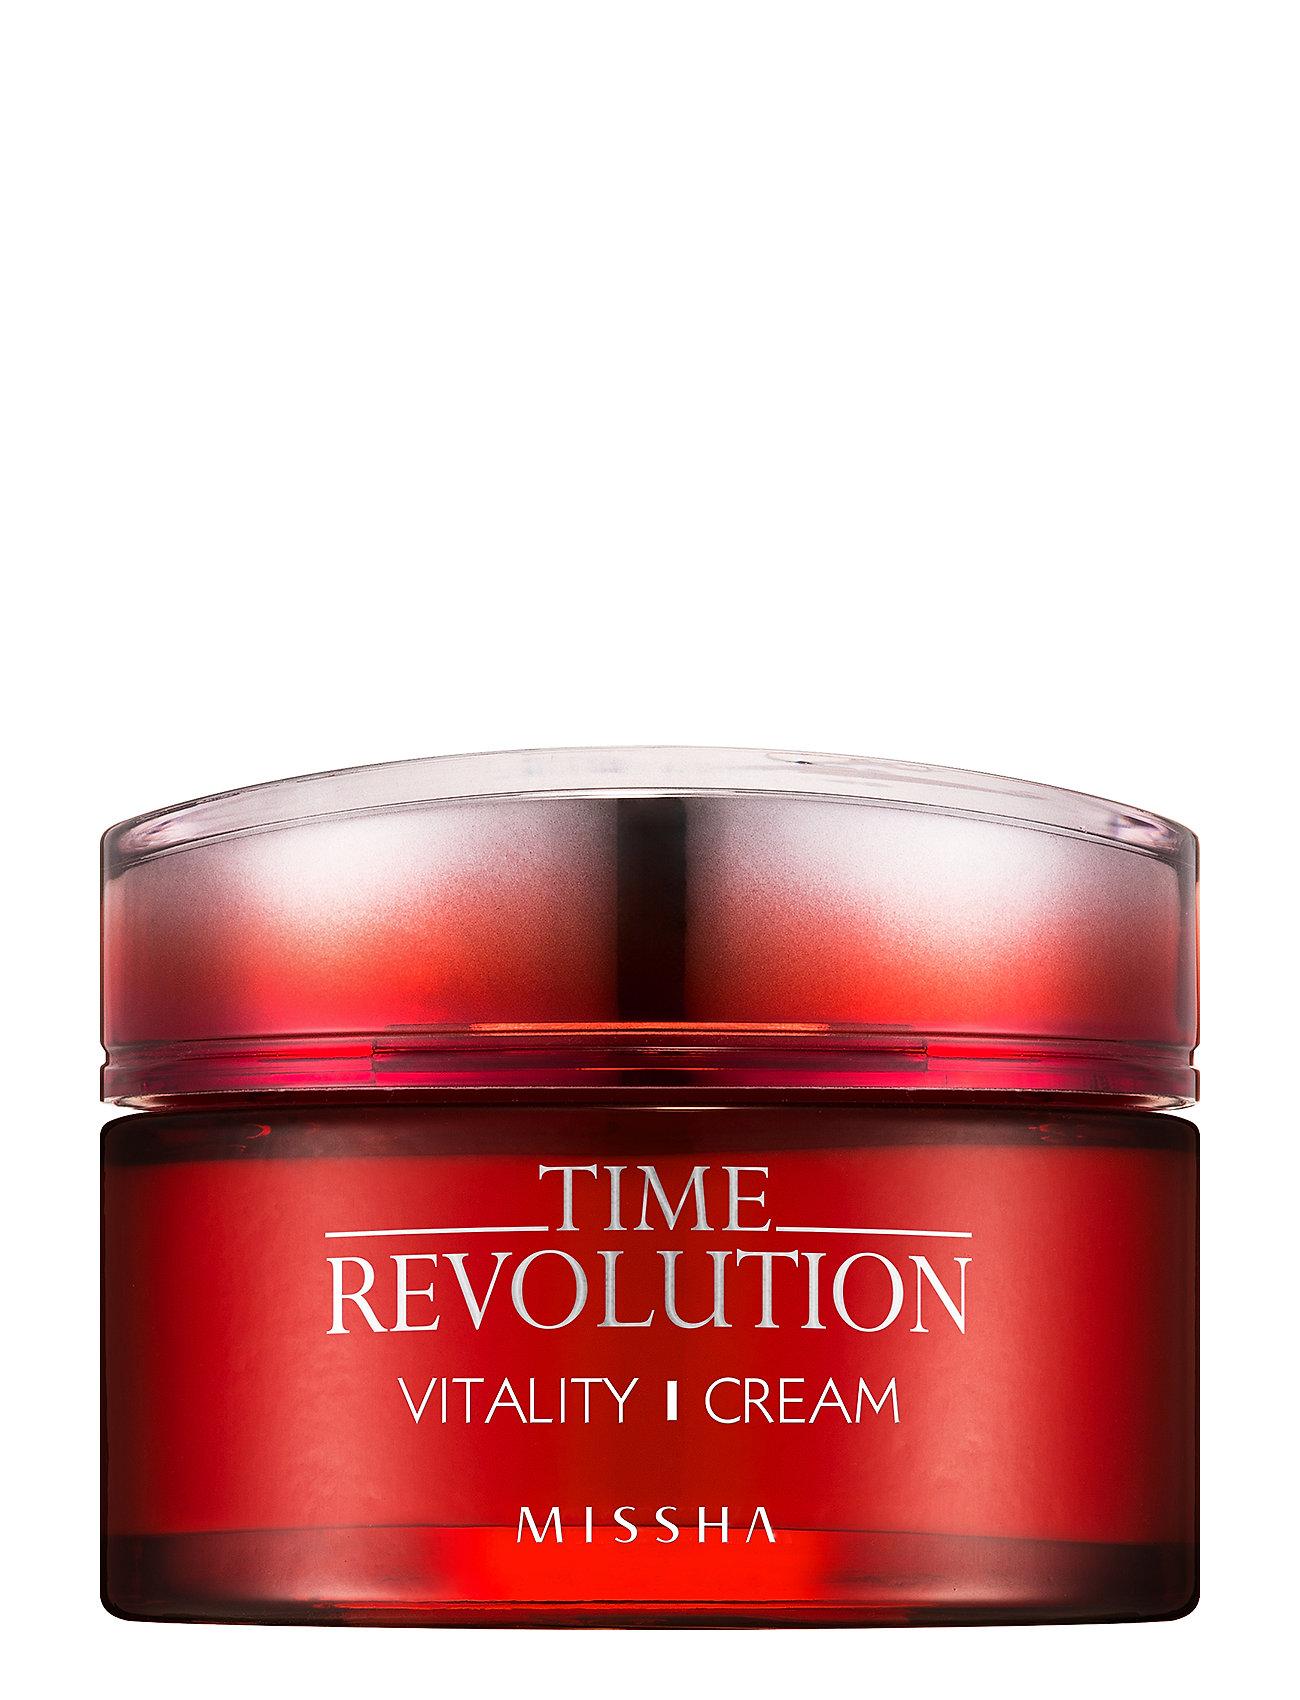 Missha Time Revolution Vitality Cream - Missha